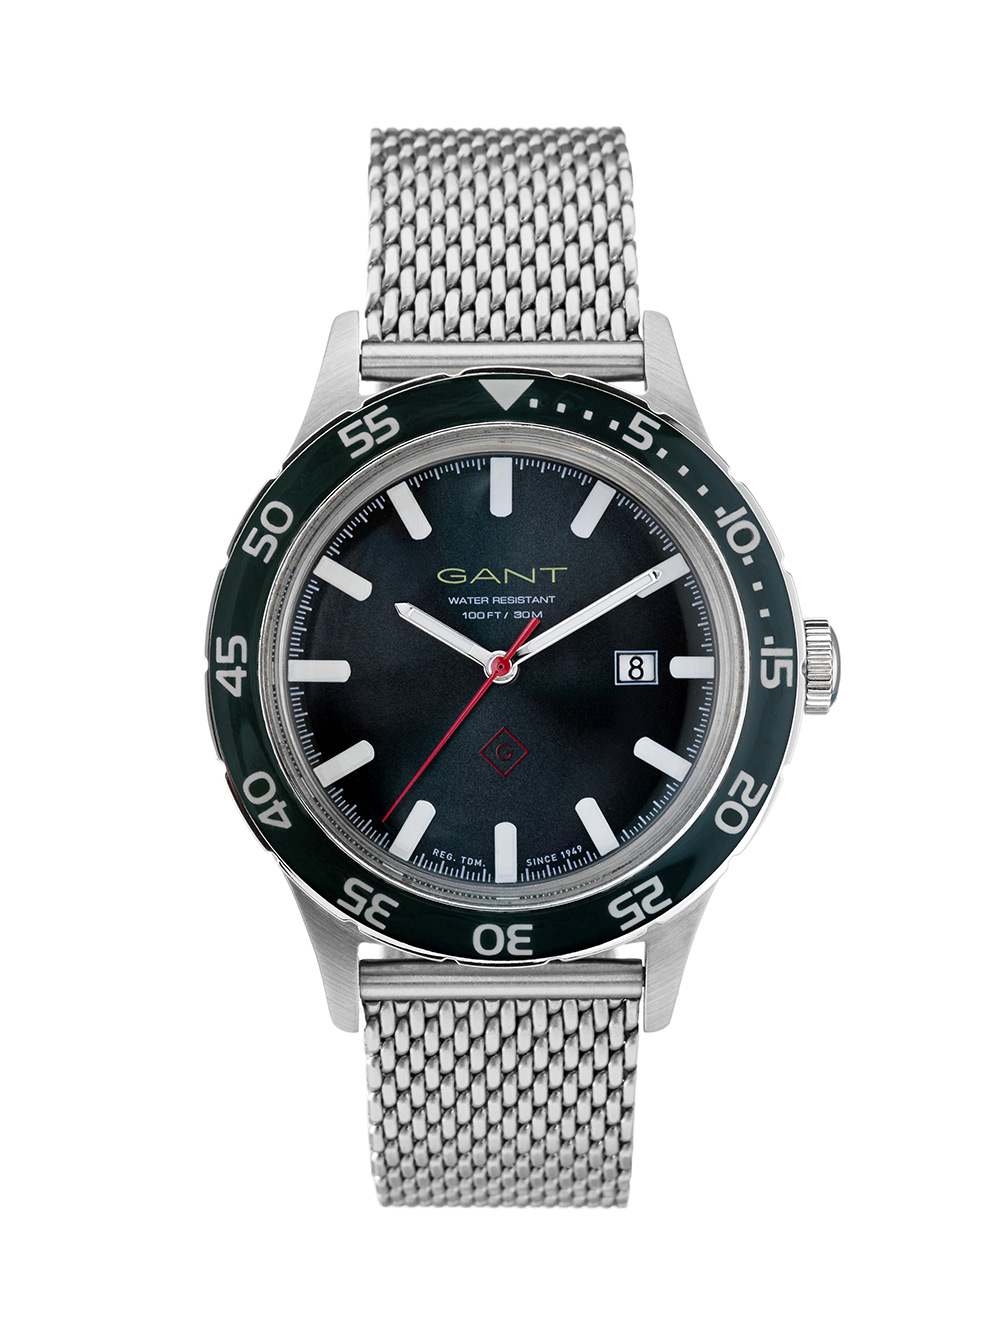 gant-rugger-las-watch-03